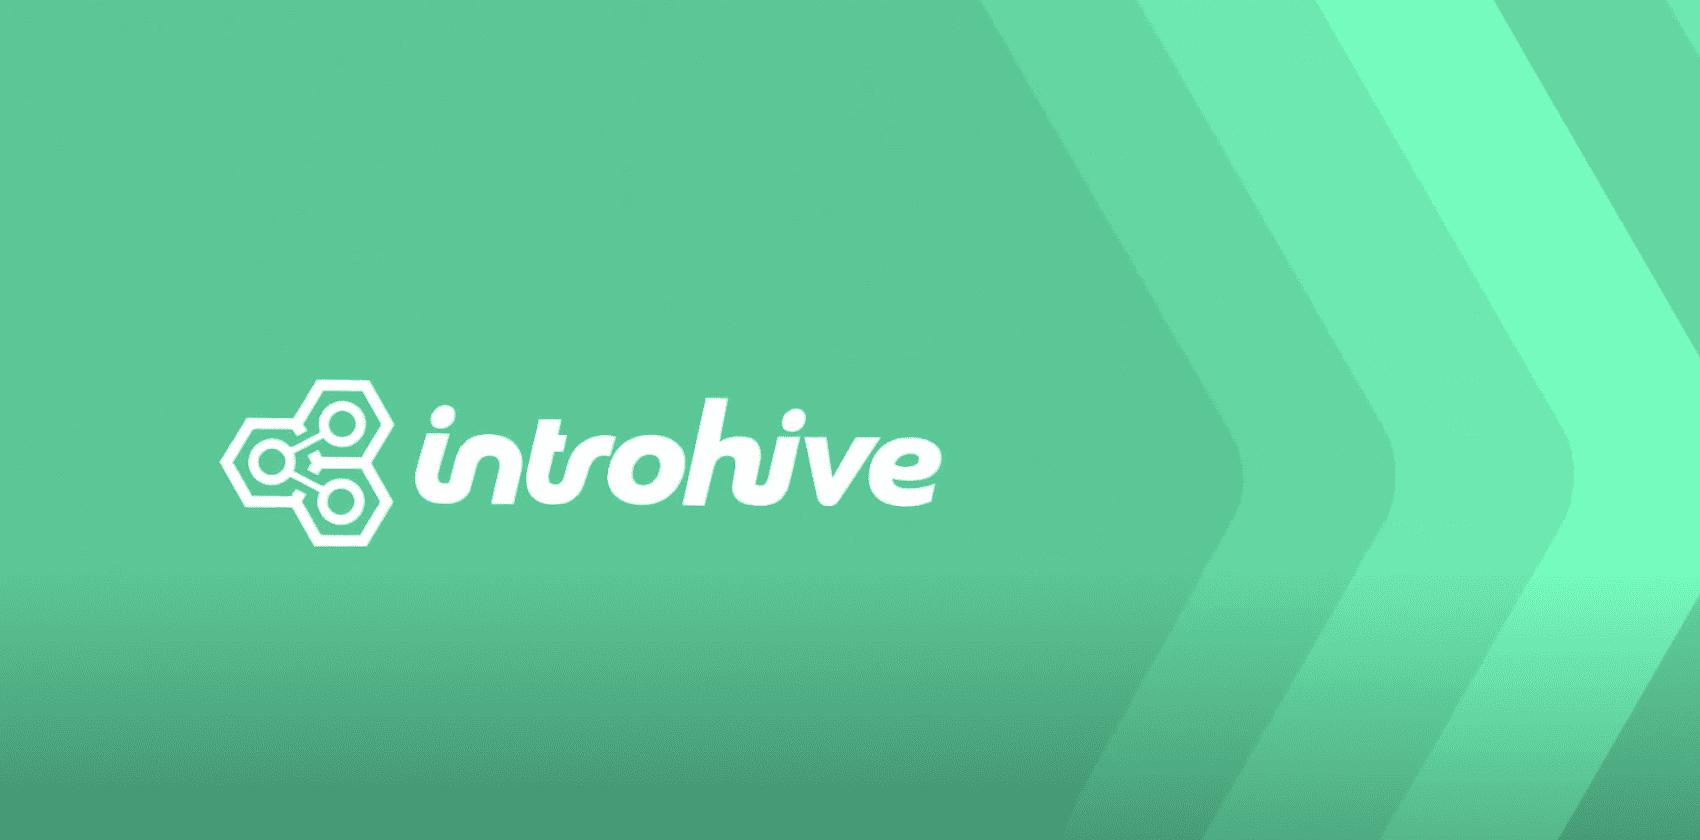 introhive revenue acceleration